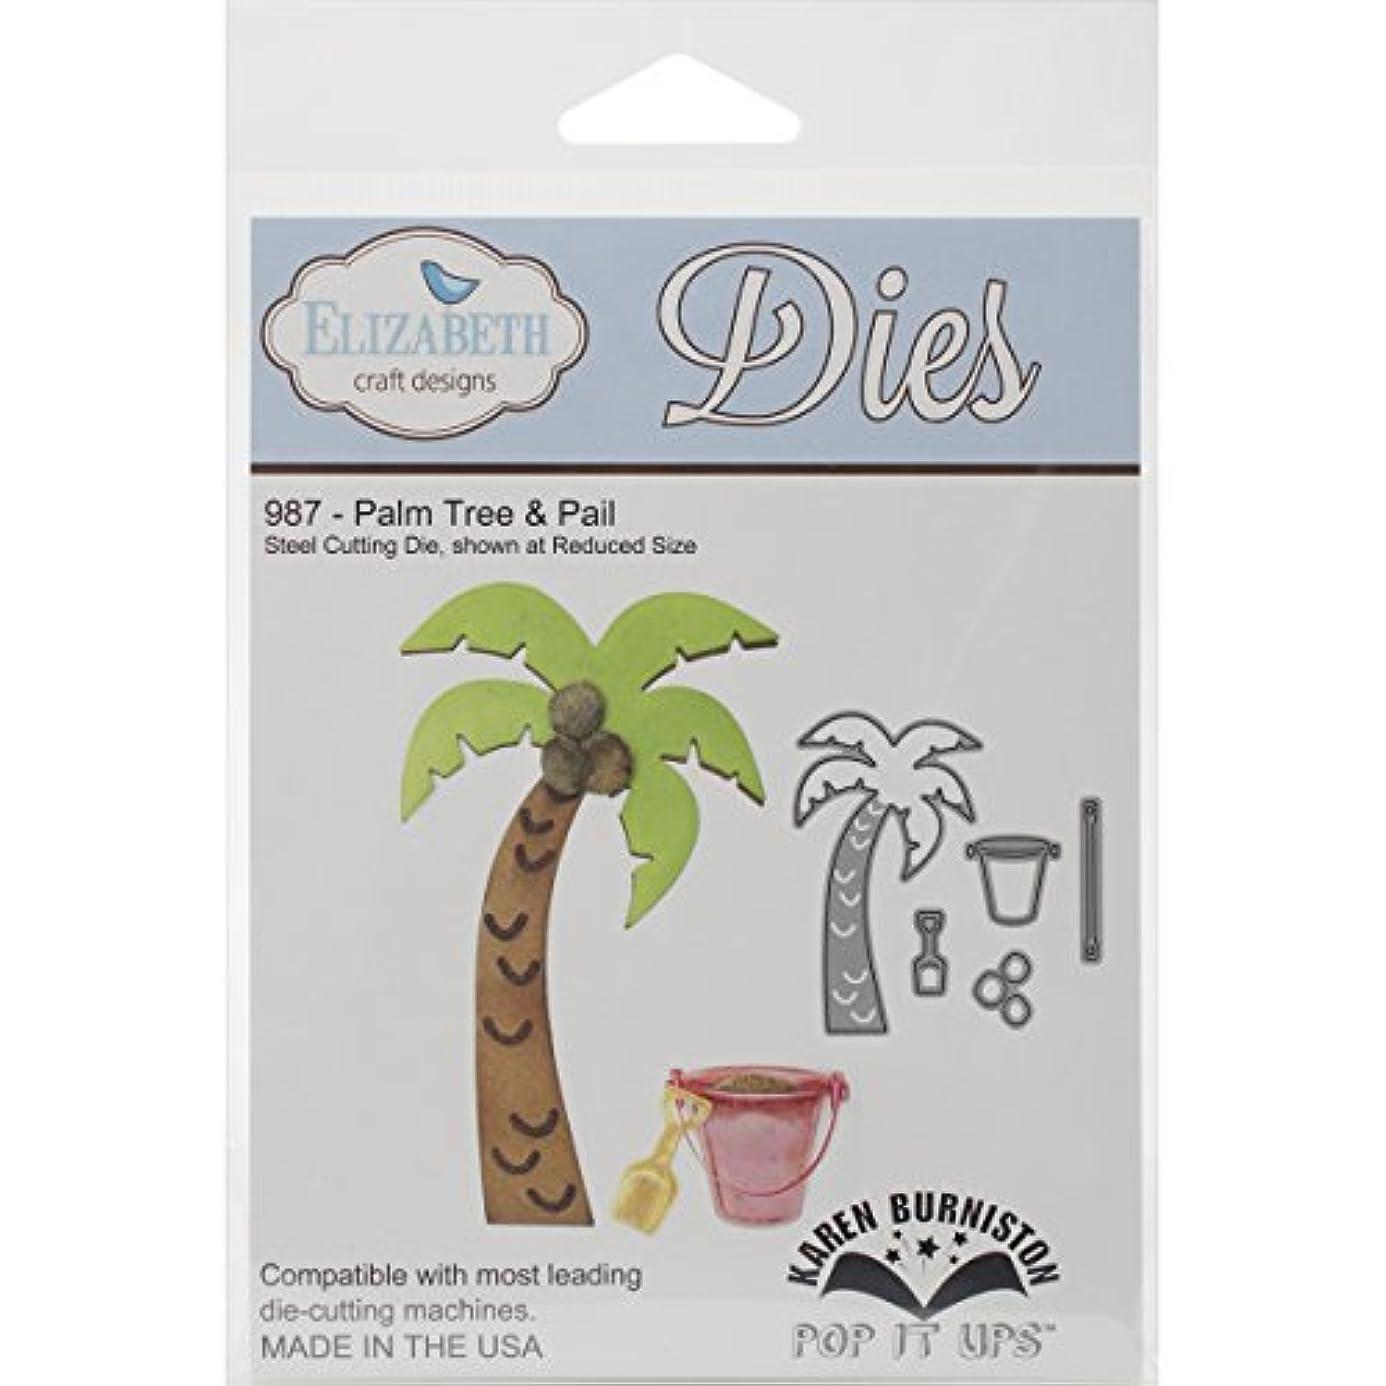 Elizabeth Craft Designs Steel Cutting Die, Palm Tree and Pail bxg6818381